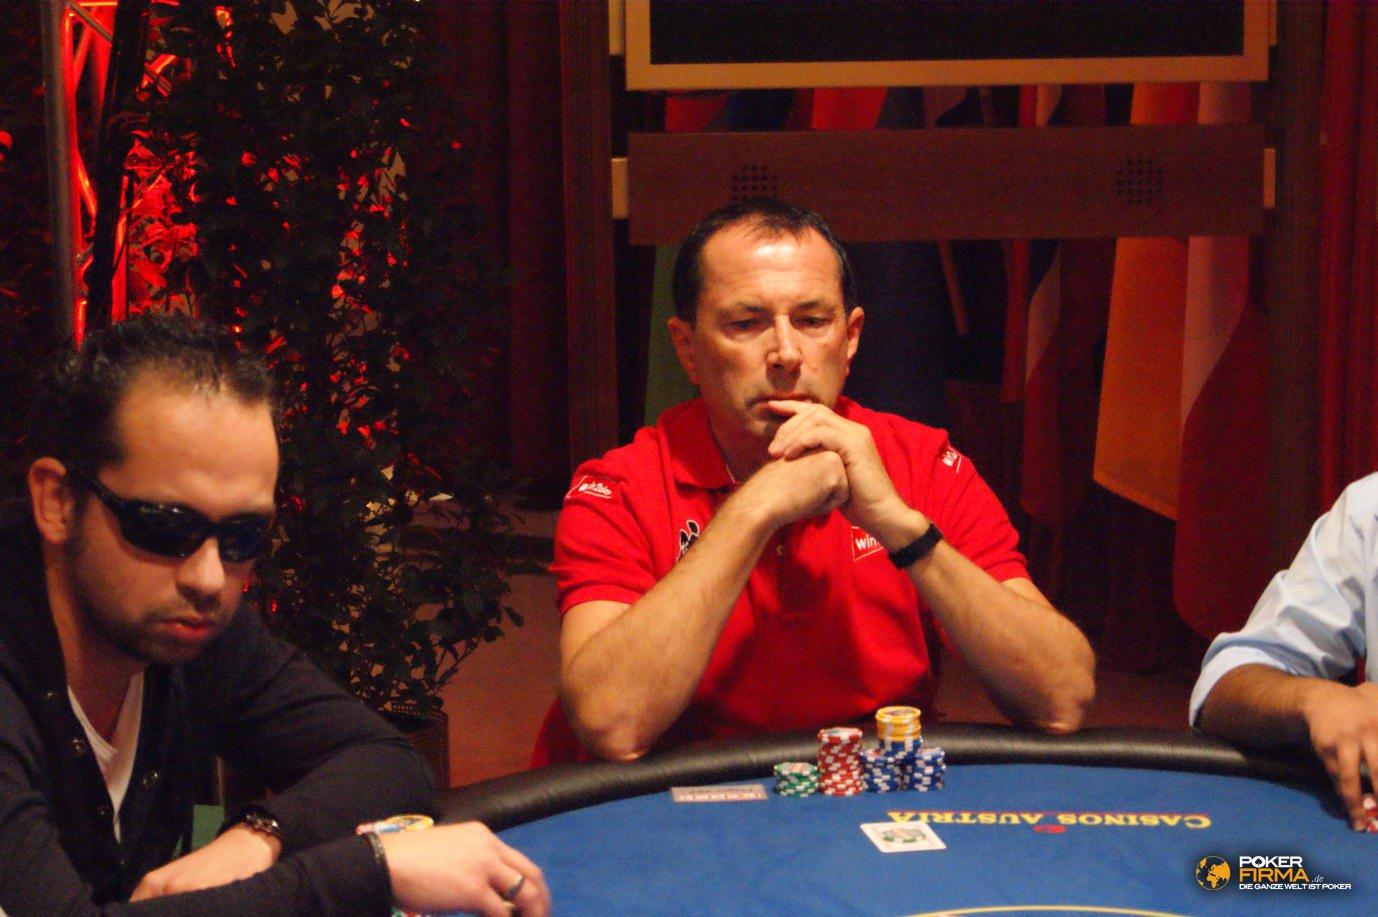 Poker_EM_2000_NLH_251011_Sigi_Stockingeer